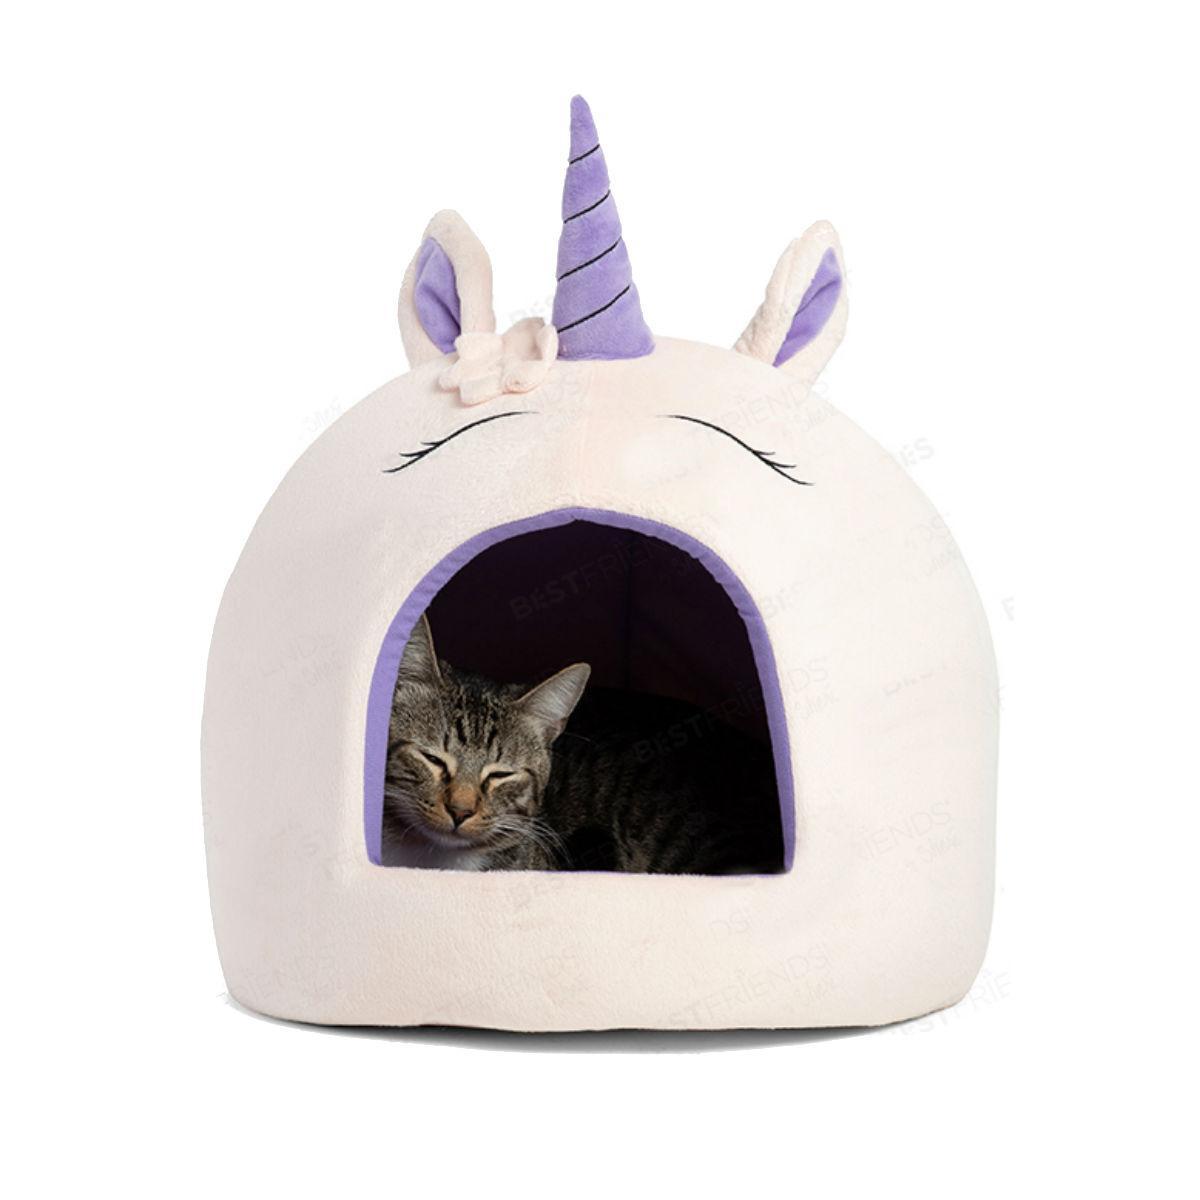 Unicorn Novelty Hut Pet Bed